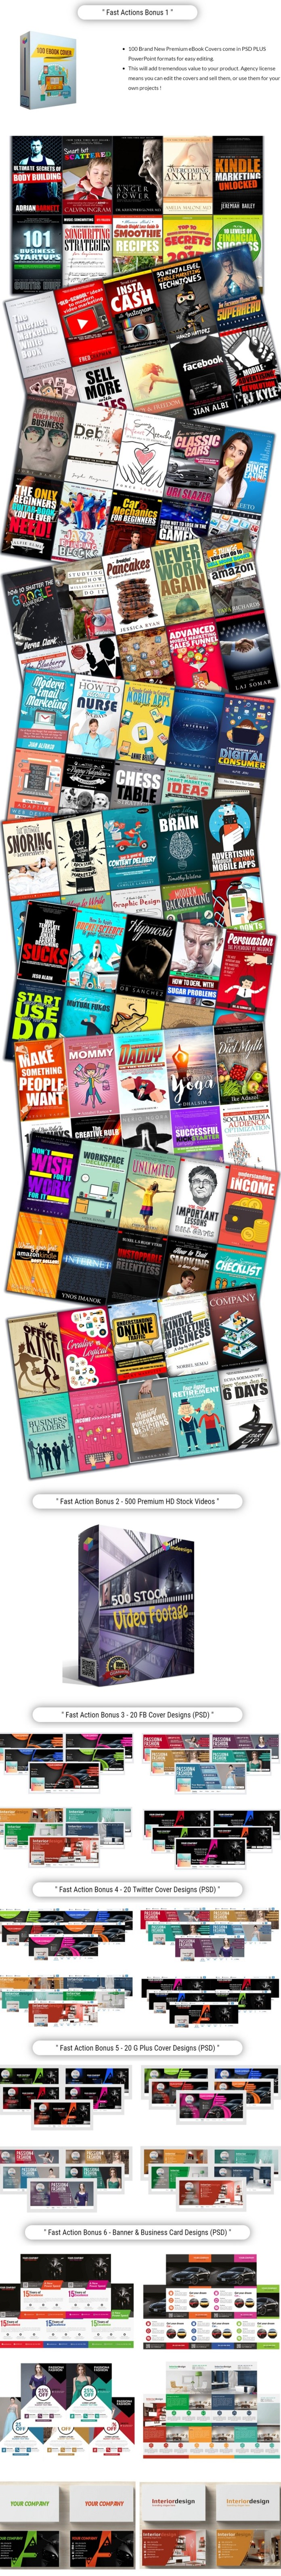 Book Brag Bonus